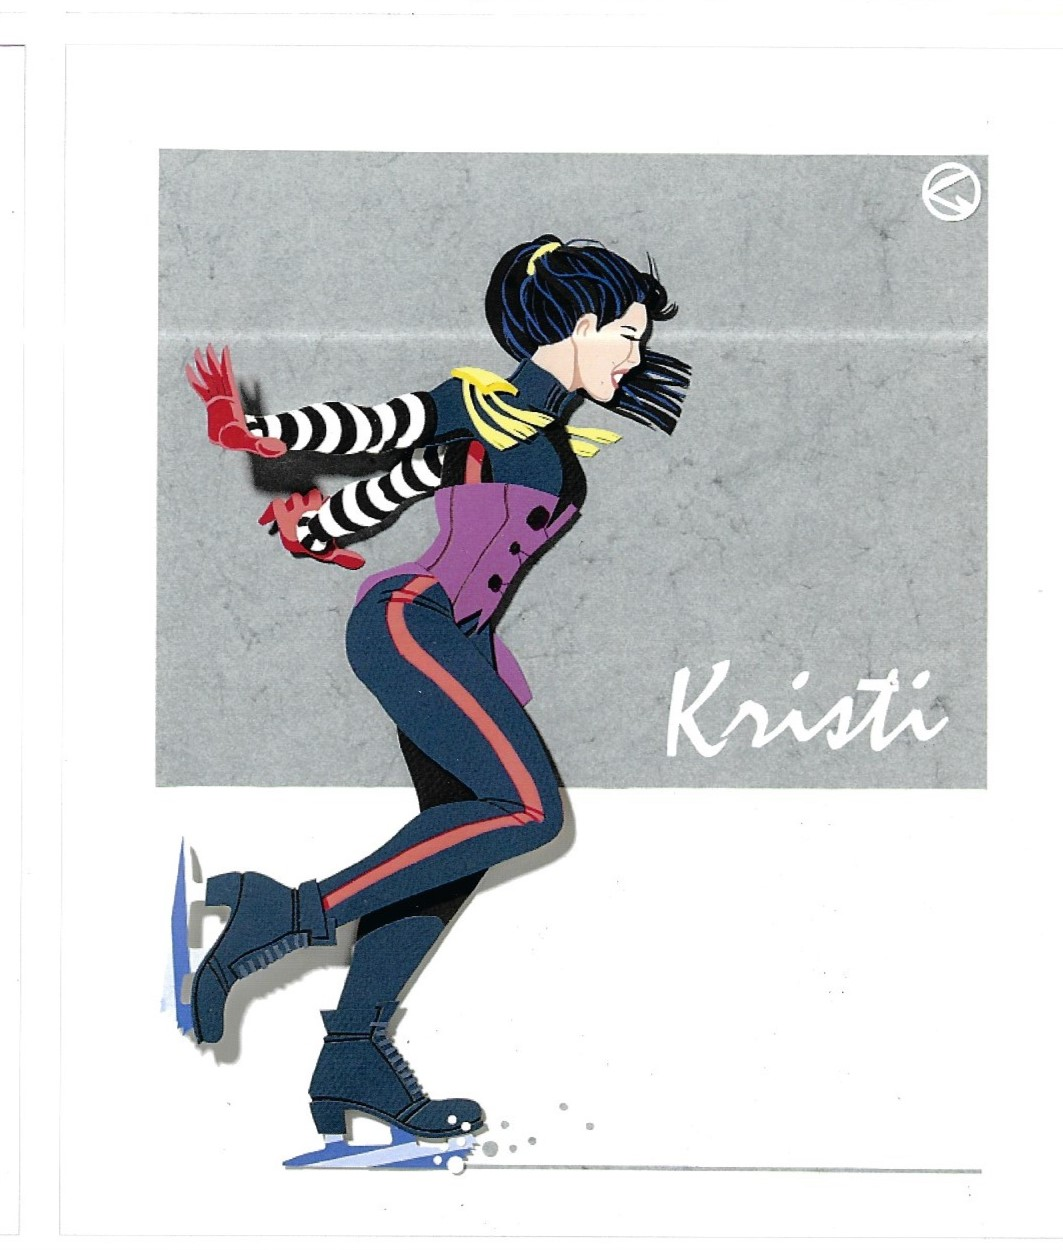 Kristi Yamaguchi CPS